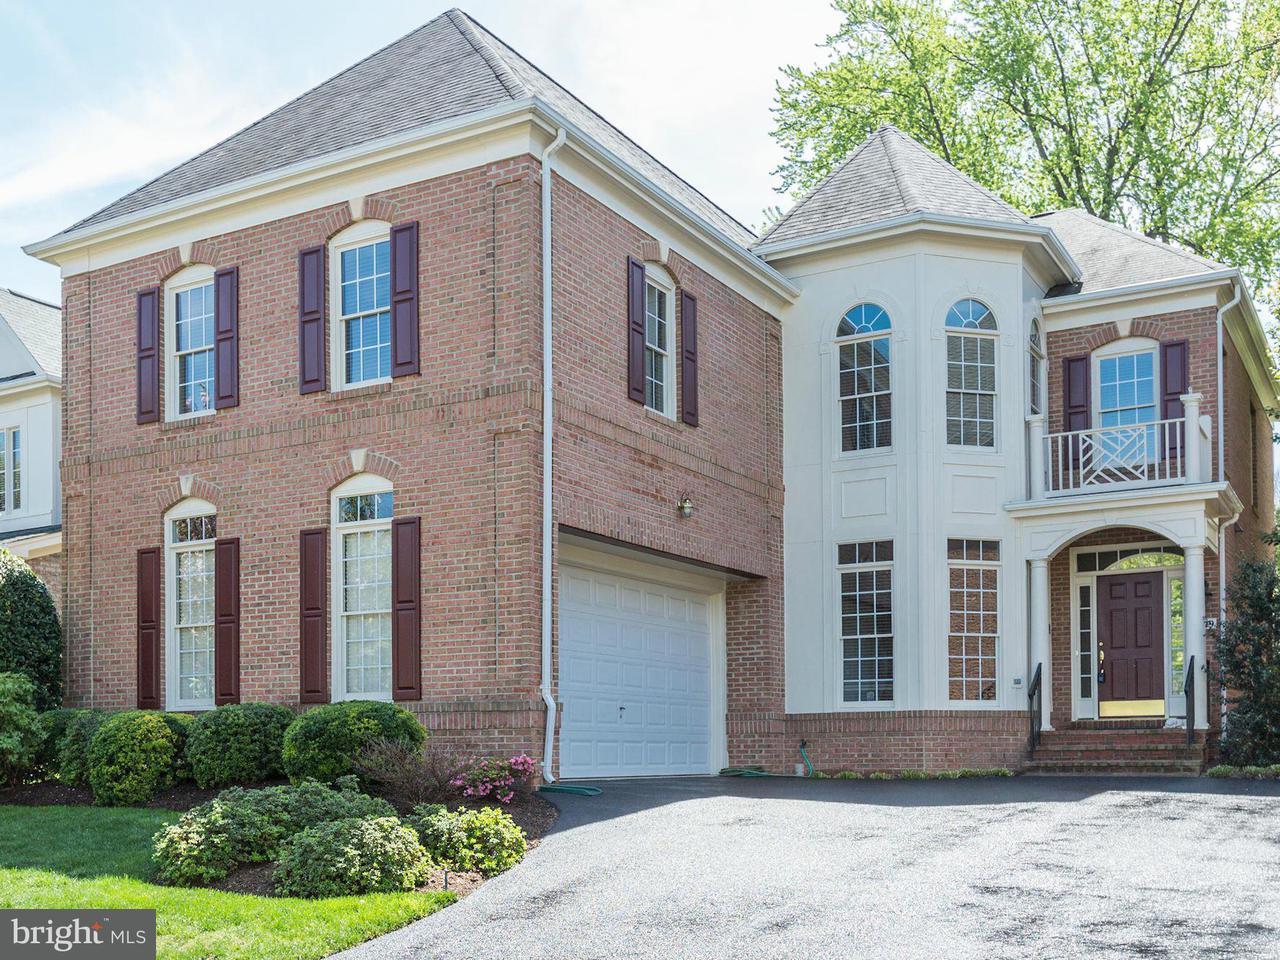 Single Family Home for Sale at 3849 FARRCROFT Drive 3849 FARRCROFT Drive Fairfax, Virginia 22030 United States